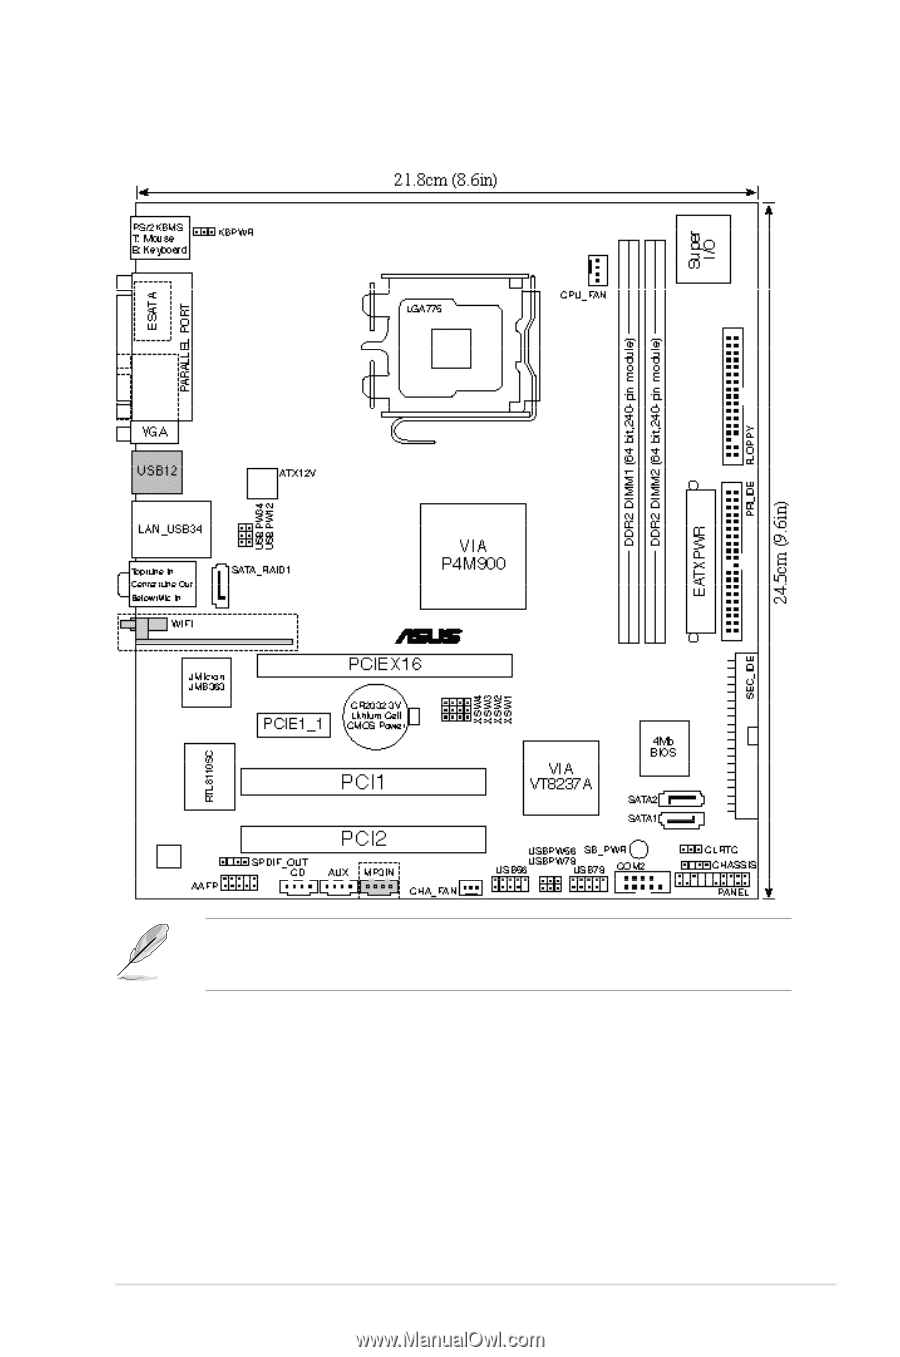 ASUS P5VD2-VM SE MANUAL PDF